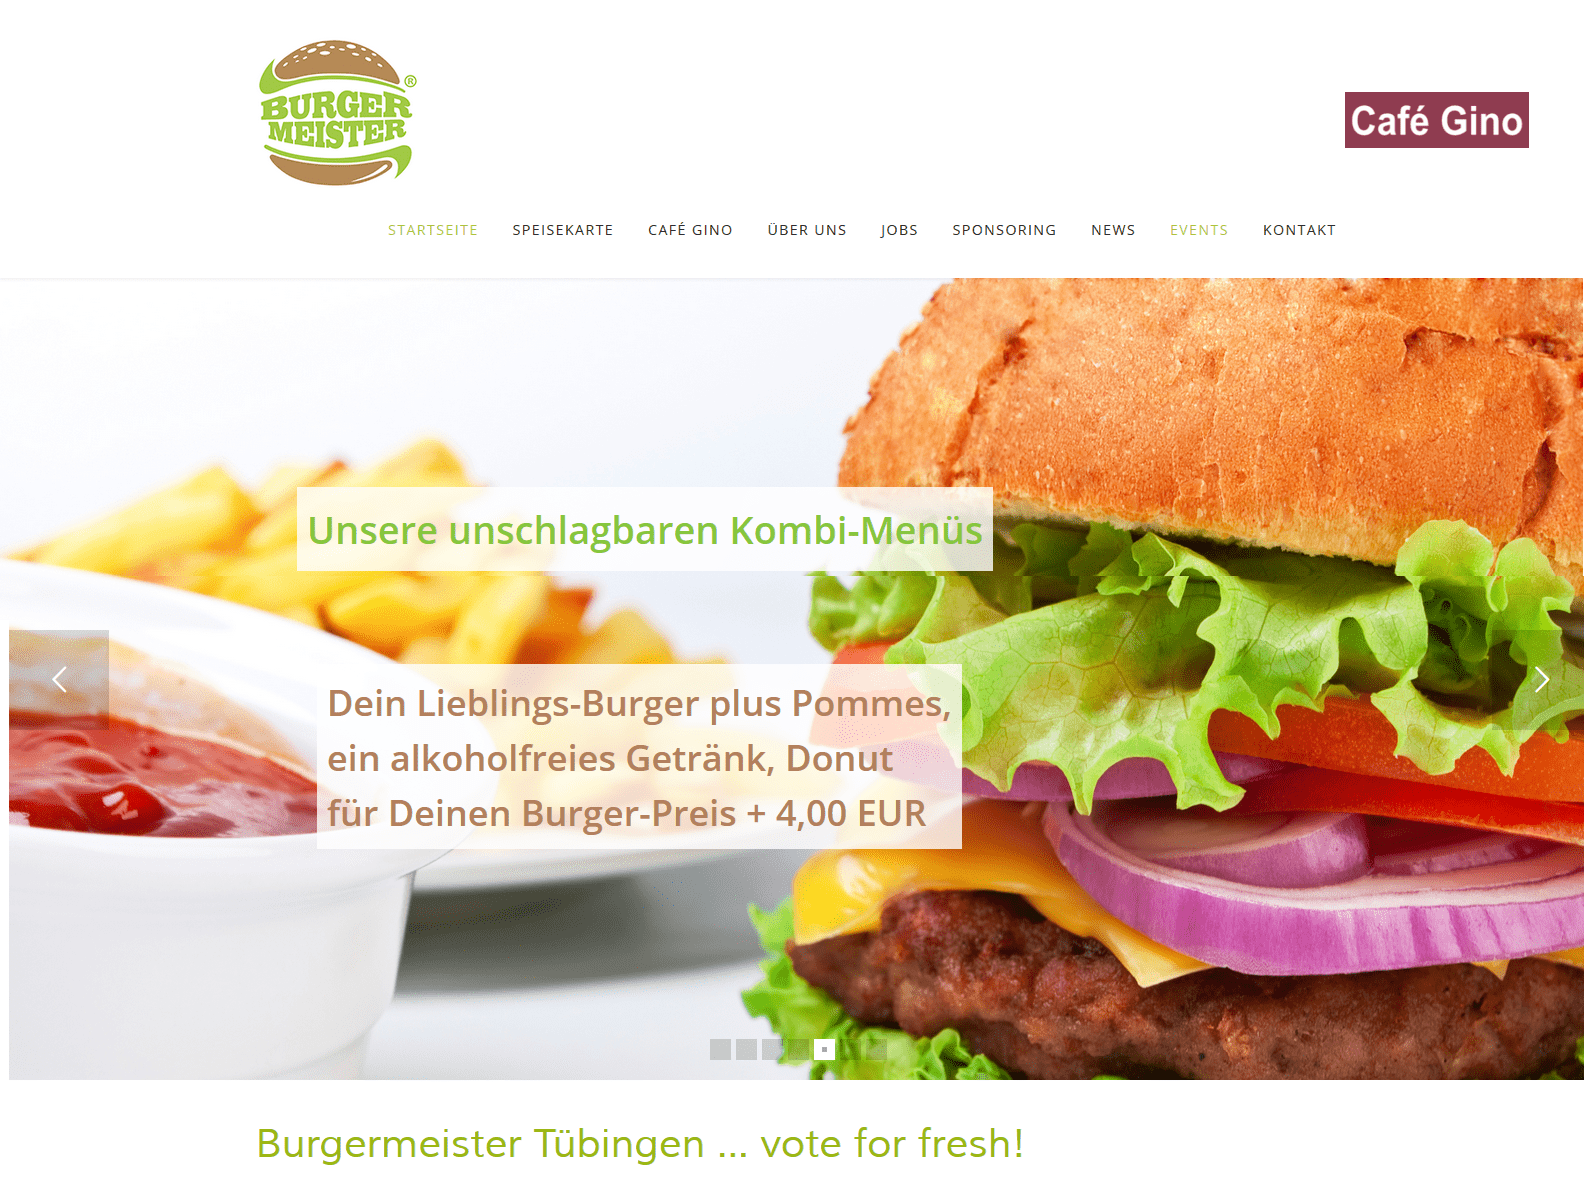 burgermeister-cafegino-tuebingen